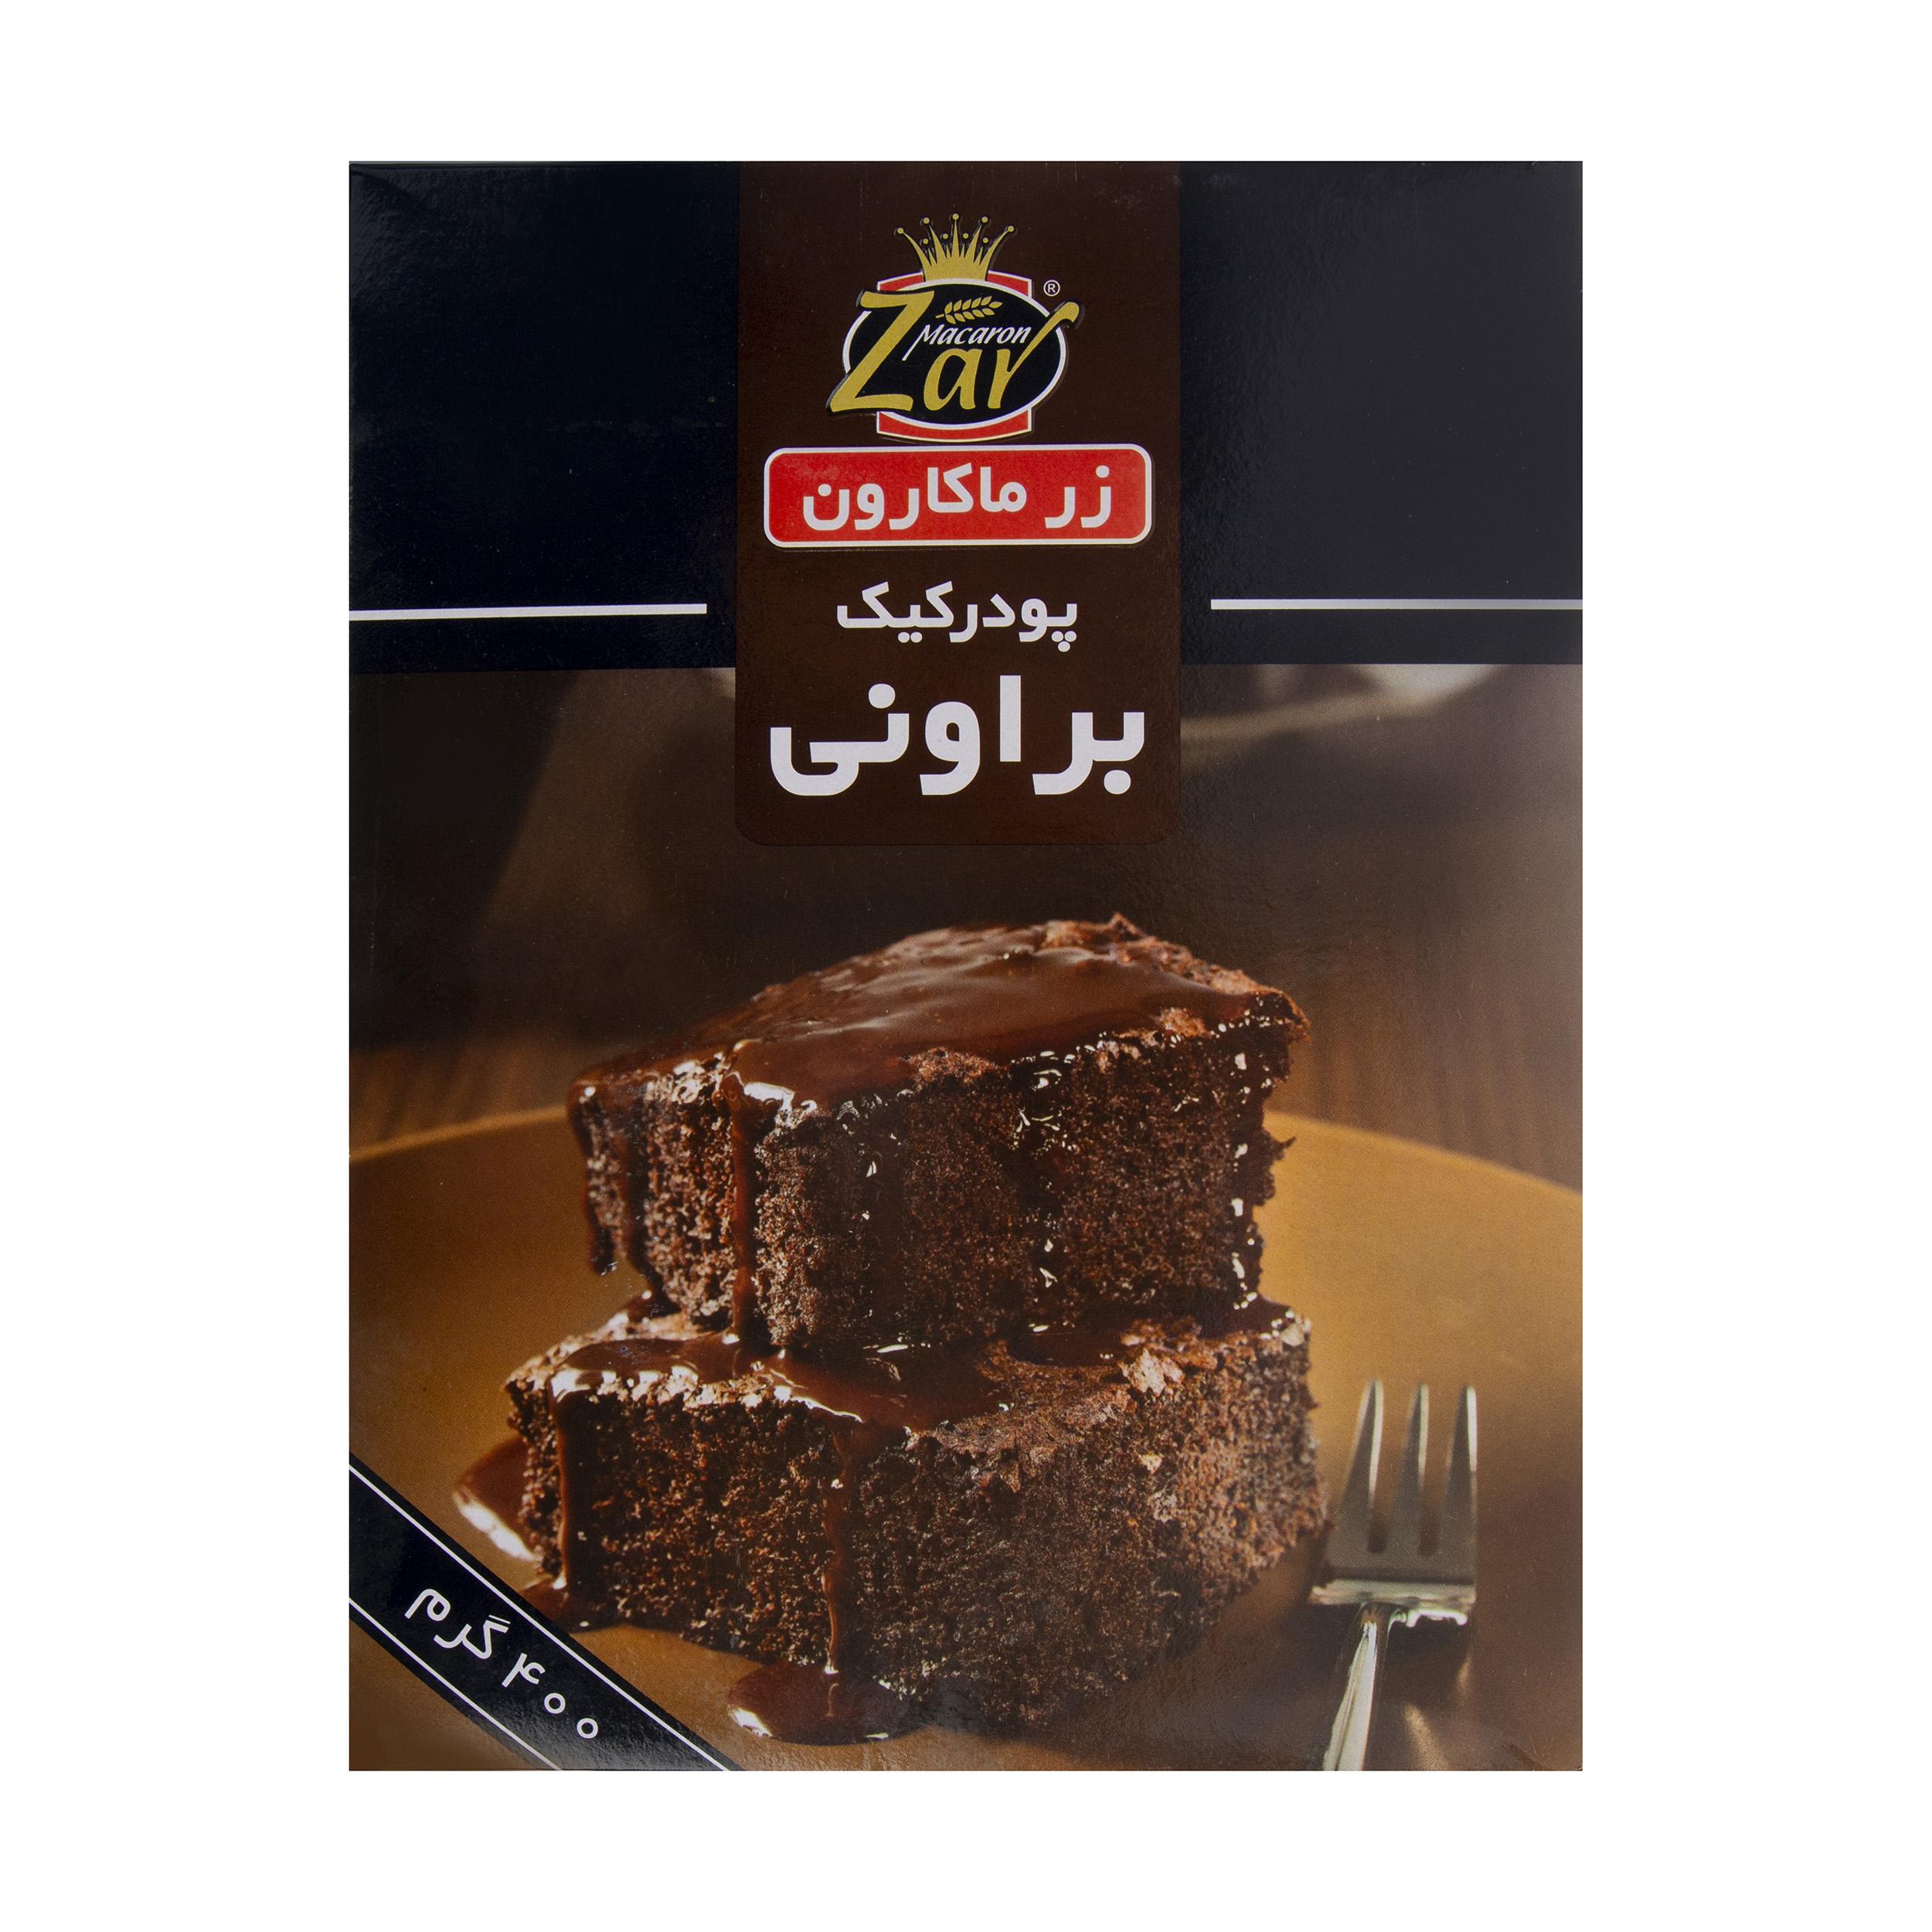 پودر کیک براونی زر ماکارون وزن 400 گرم